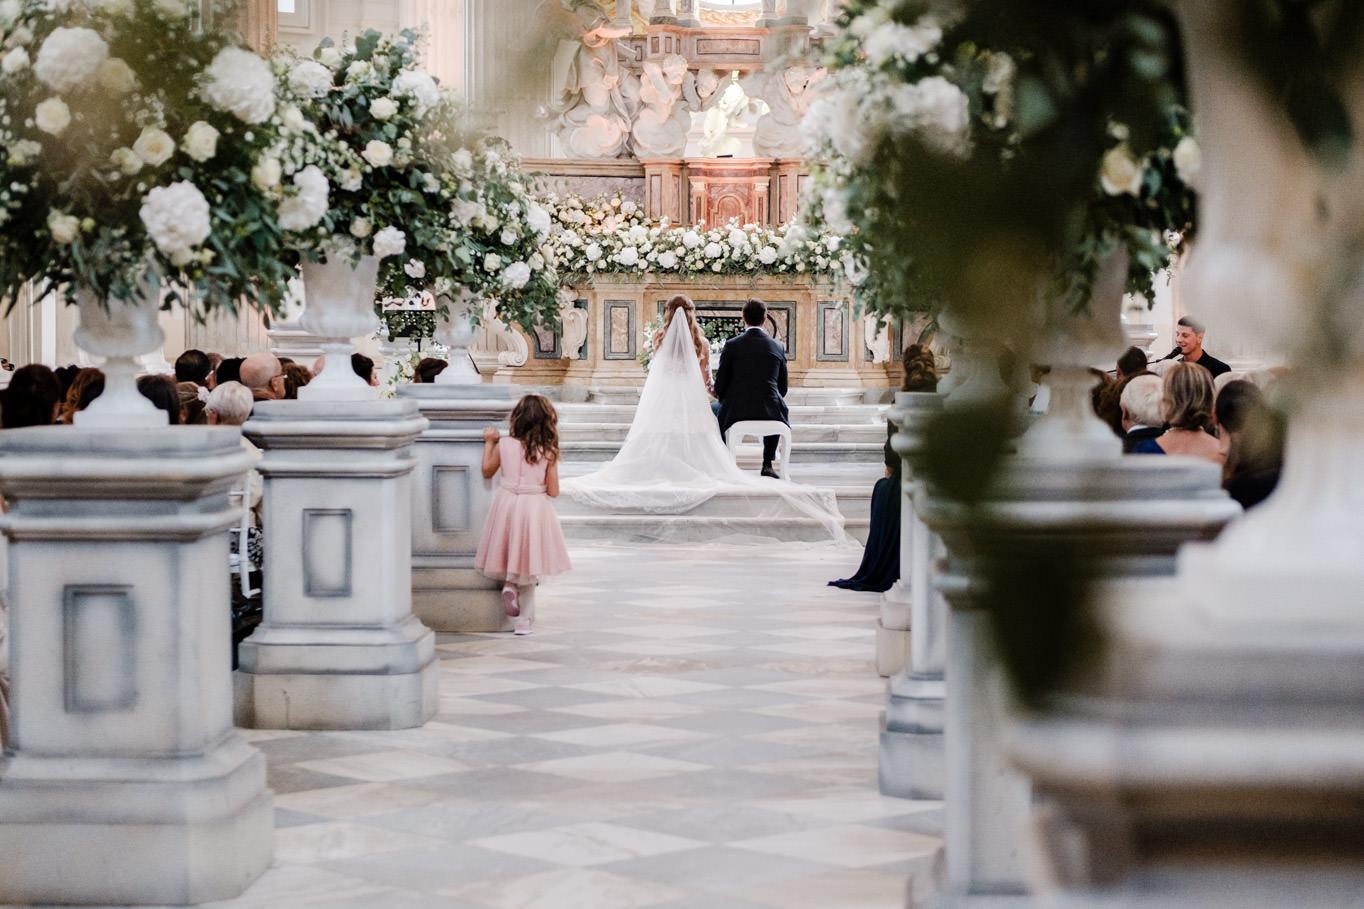 cristina chiabotto wedding ceremony